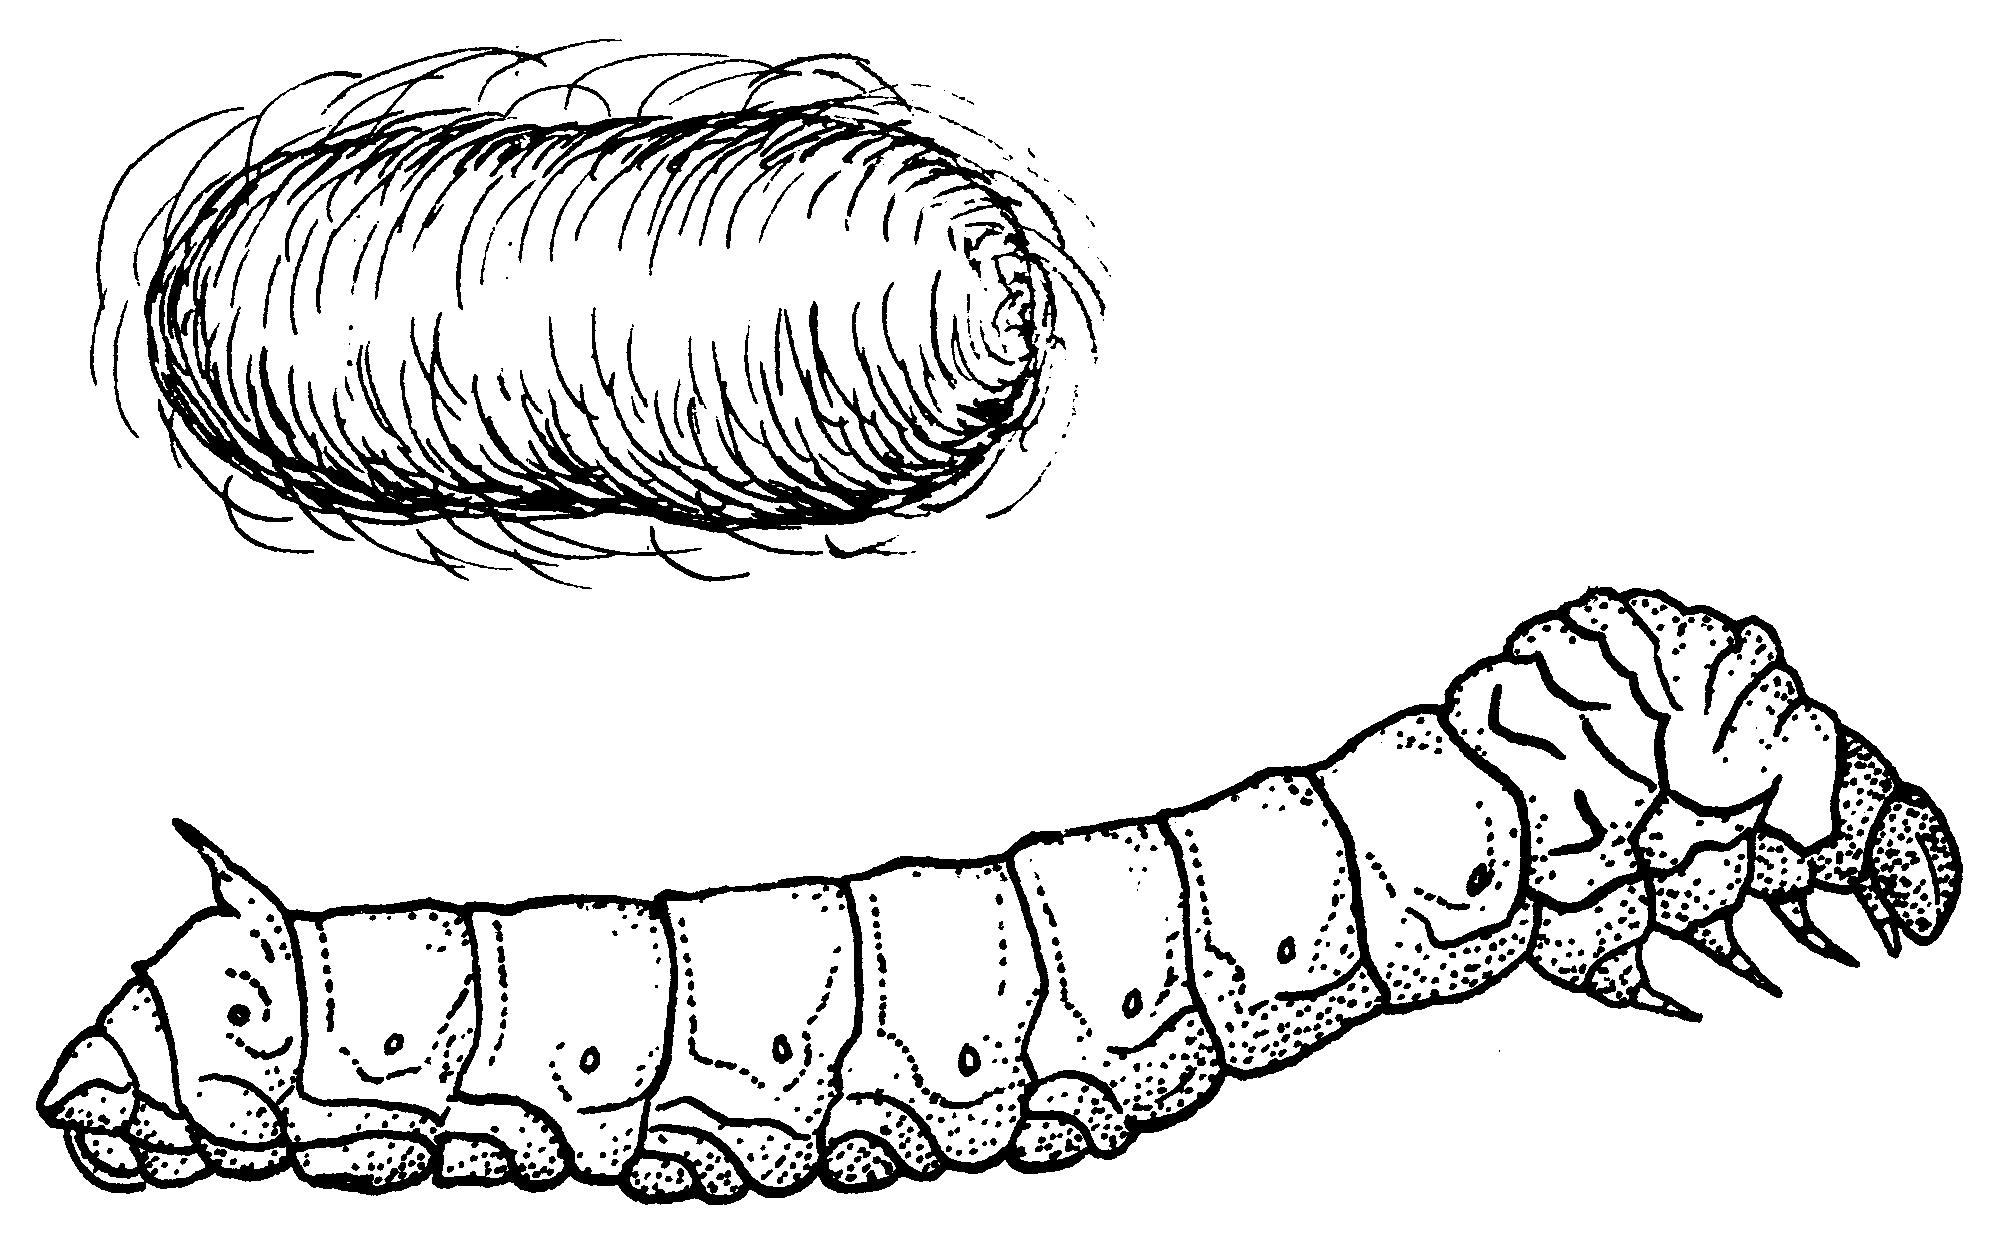 Worm clipart silkworm. Station